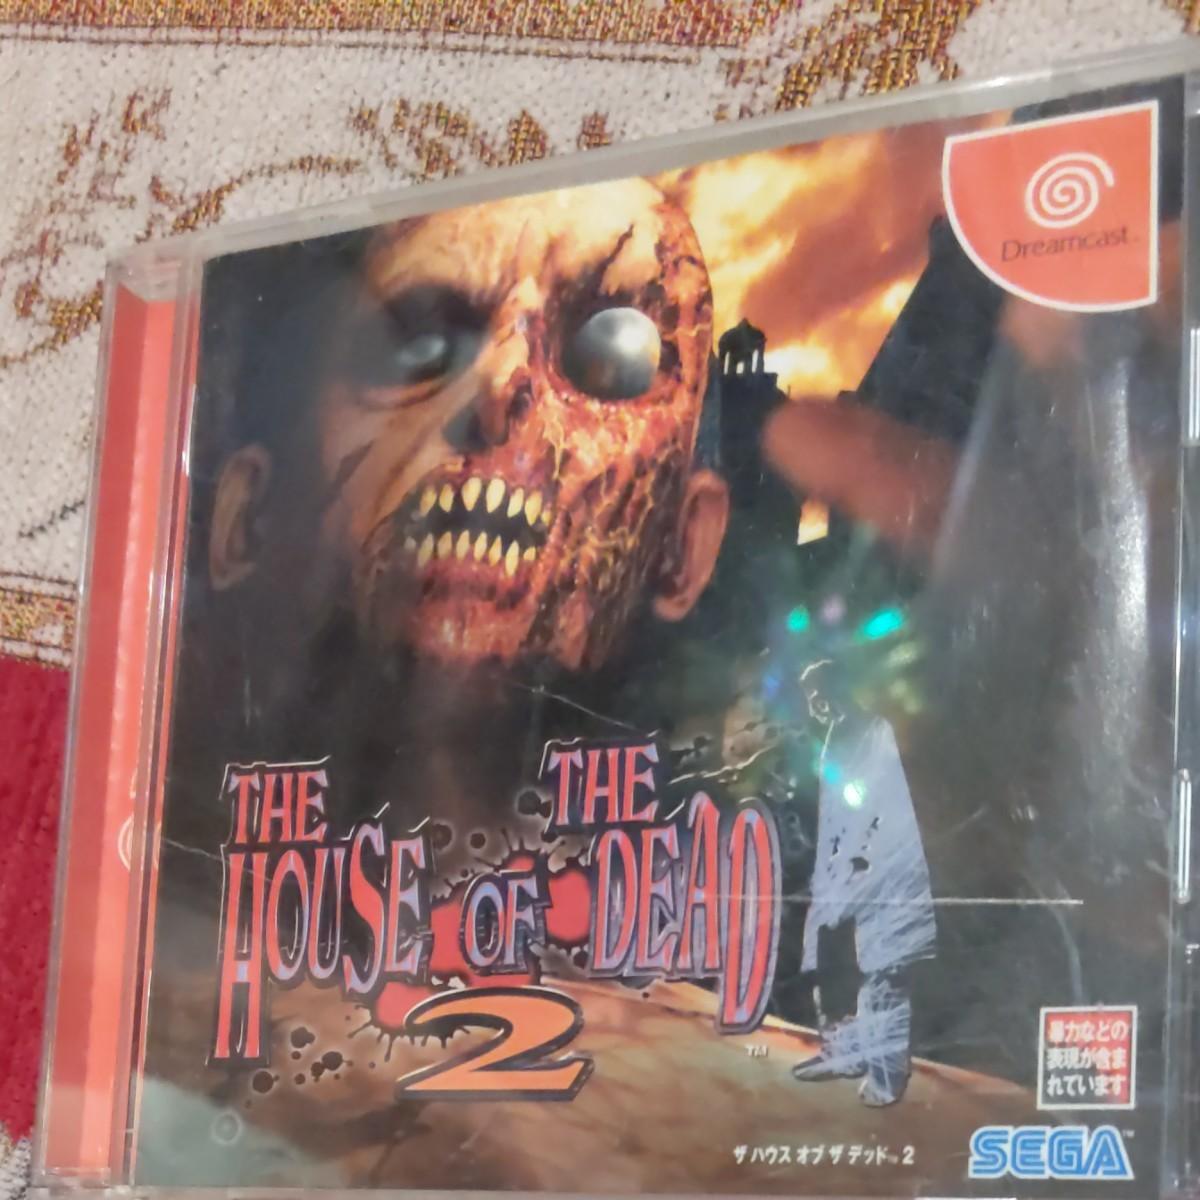 THE HOUSE OF THE DEAD2 ザハウスオブザデッド2 ドリームキャスト SEGA Dreamcast ソフト DC